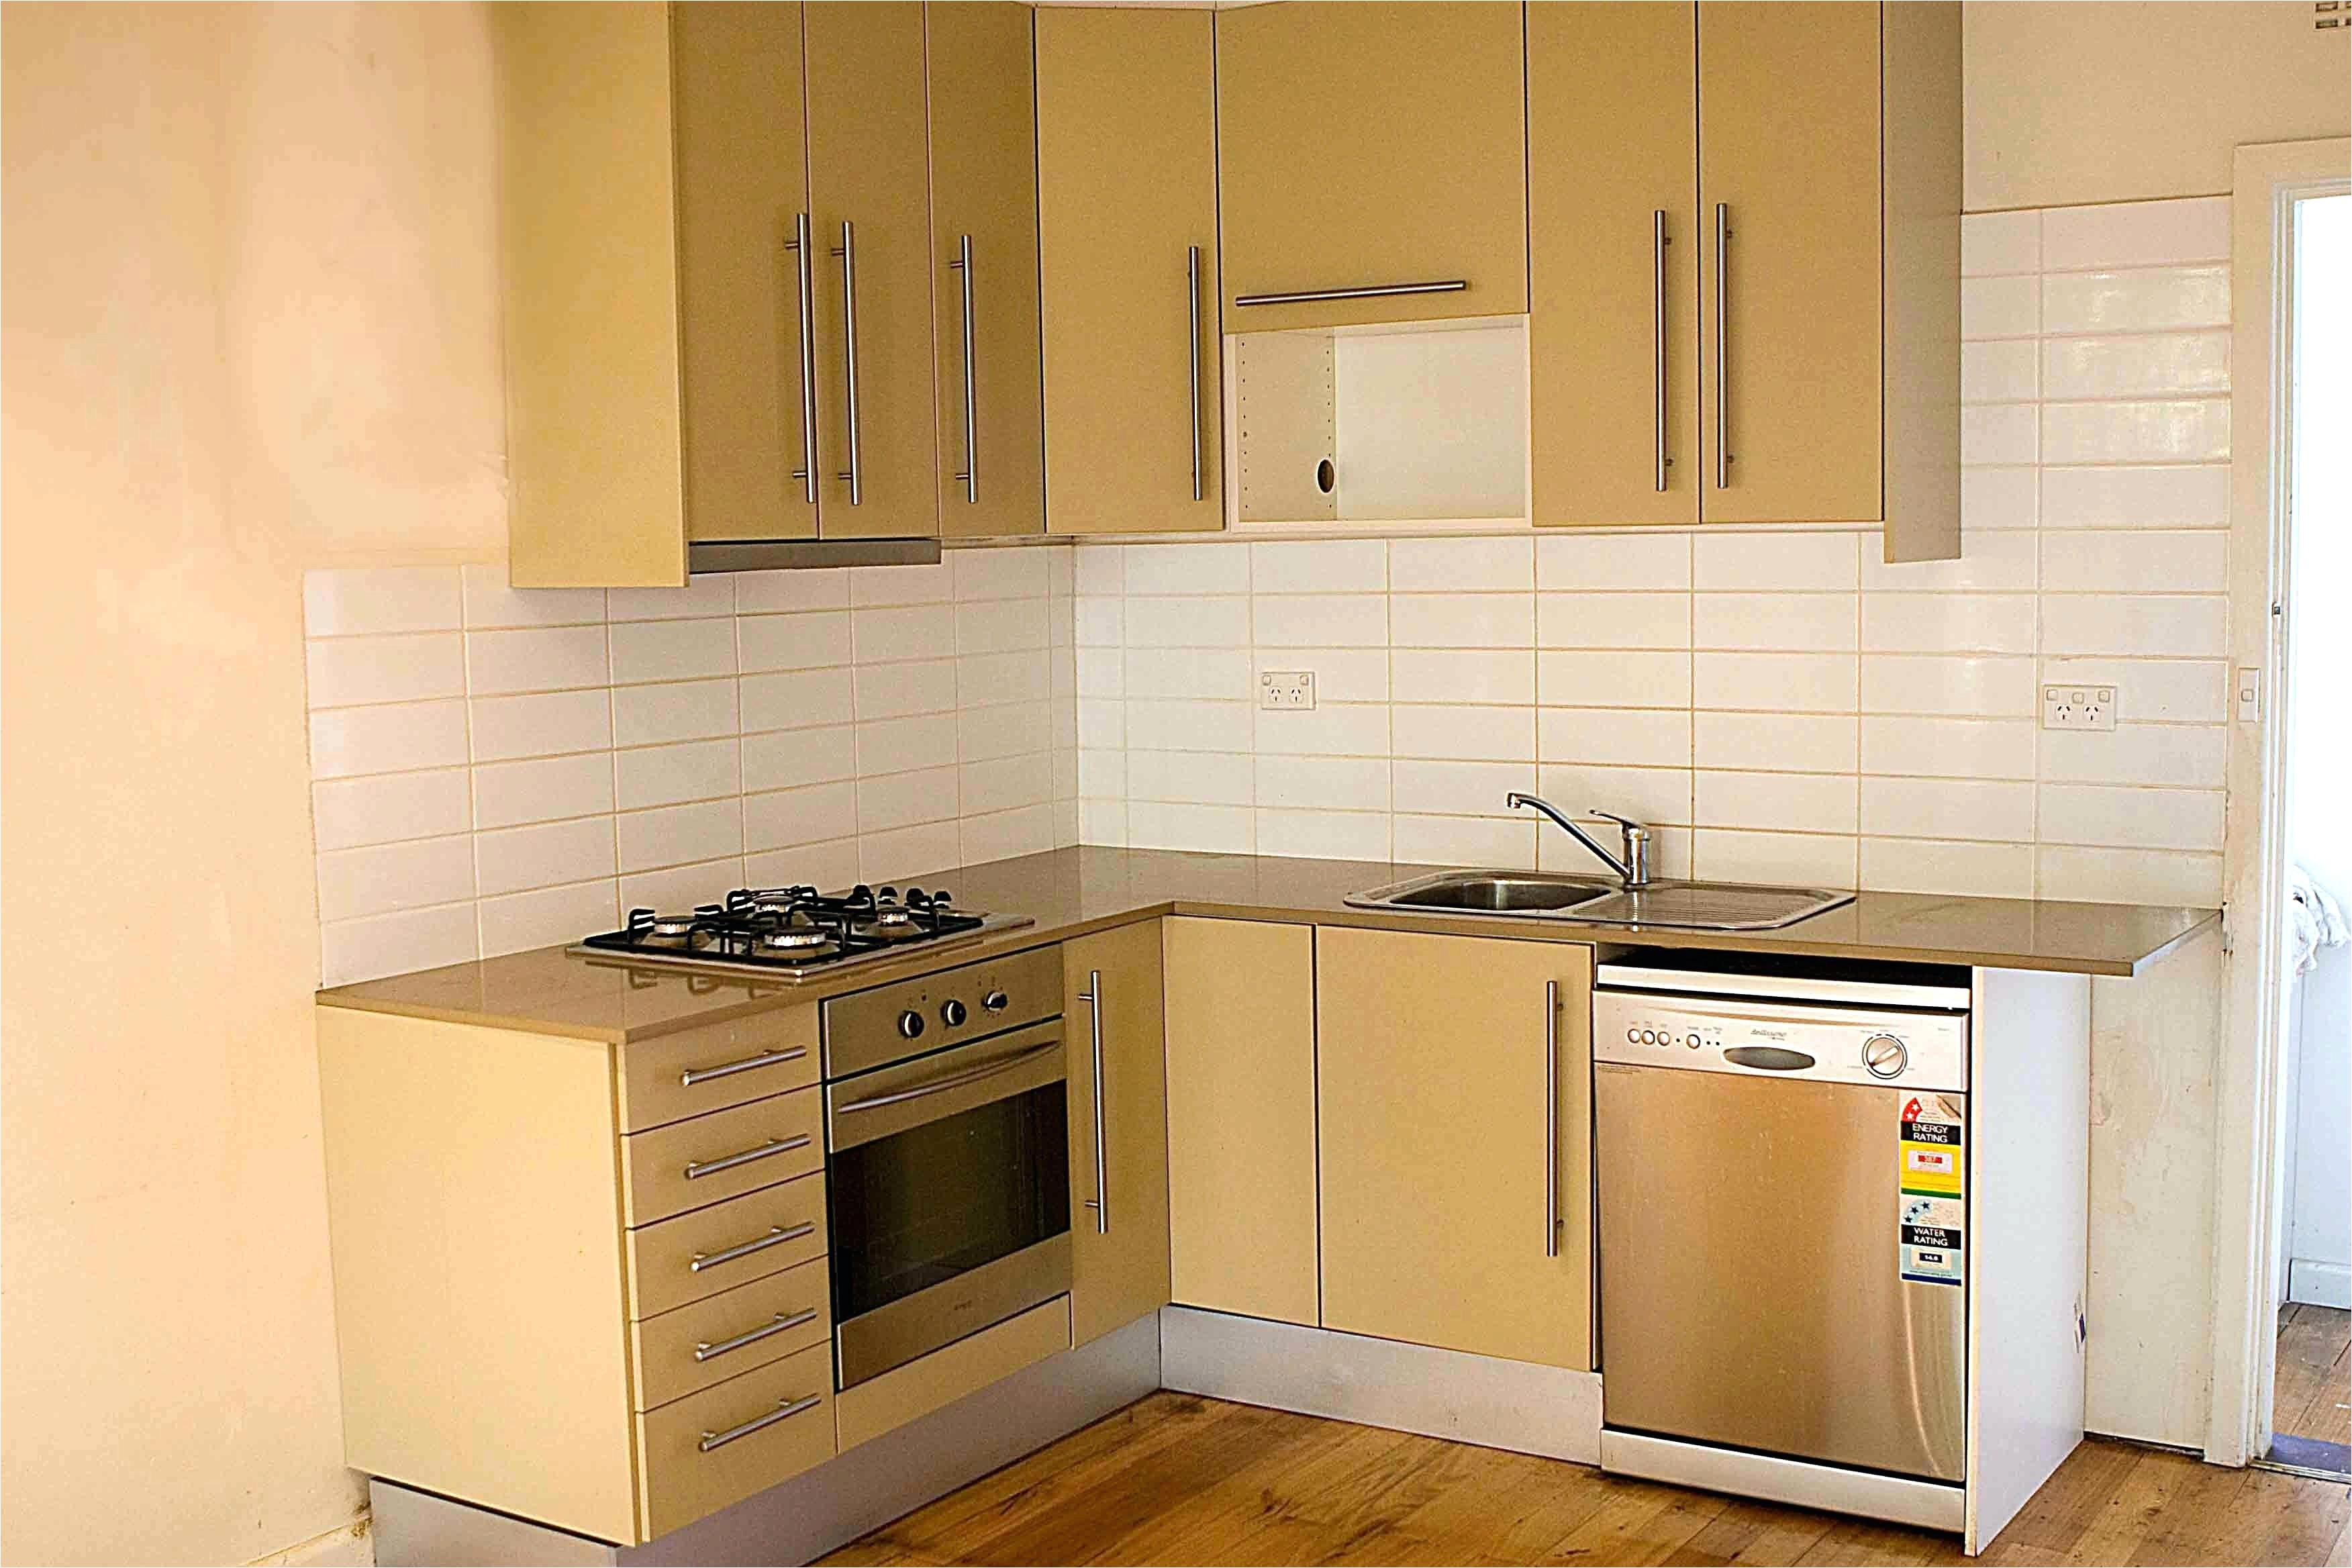 walmart kitchen appliances from kitchen cabinet organizers walmart image source advanced environments com